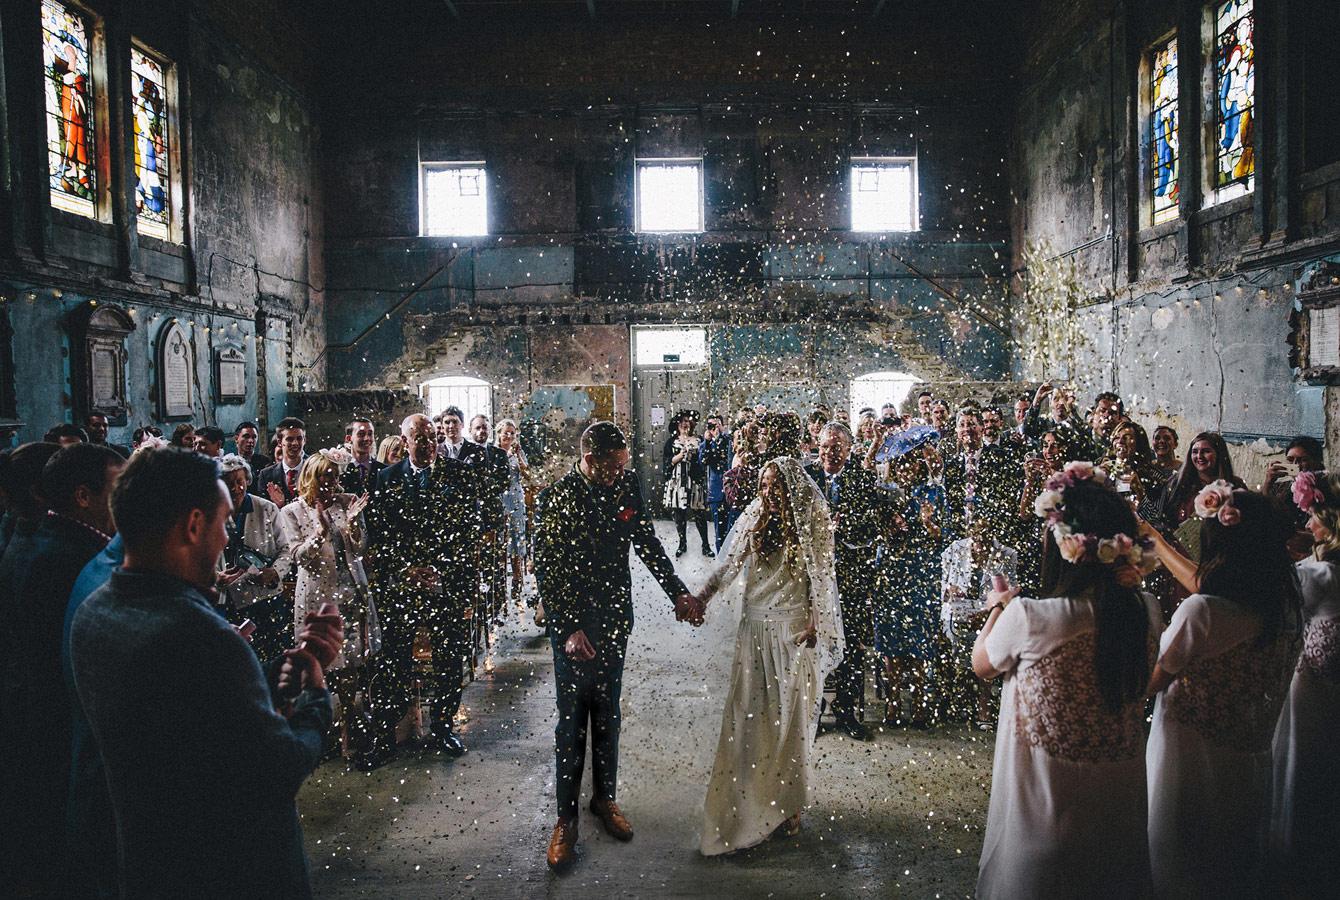 © Caroline Briggs, The Twins, Newcastle, Tyne & Wear, United Kingdom, 3st place in category Professional : Portraits, Rangefinder Wedding Contest 2017 Winners